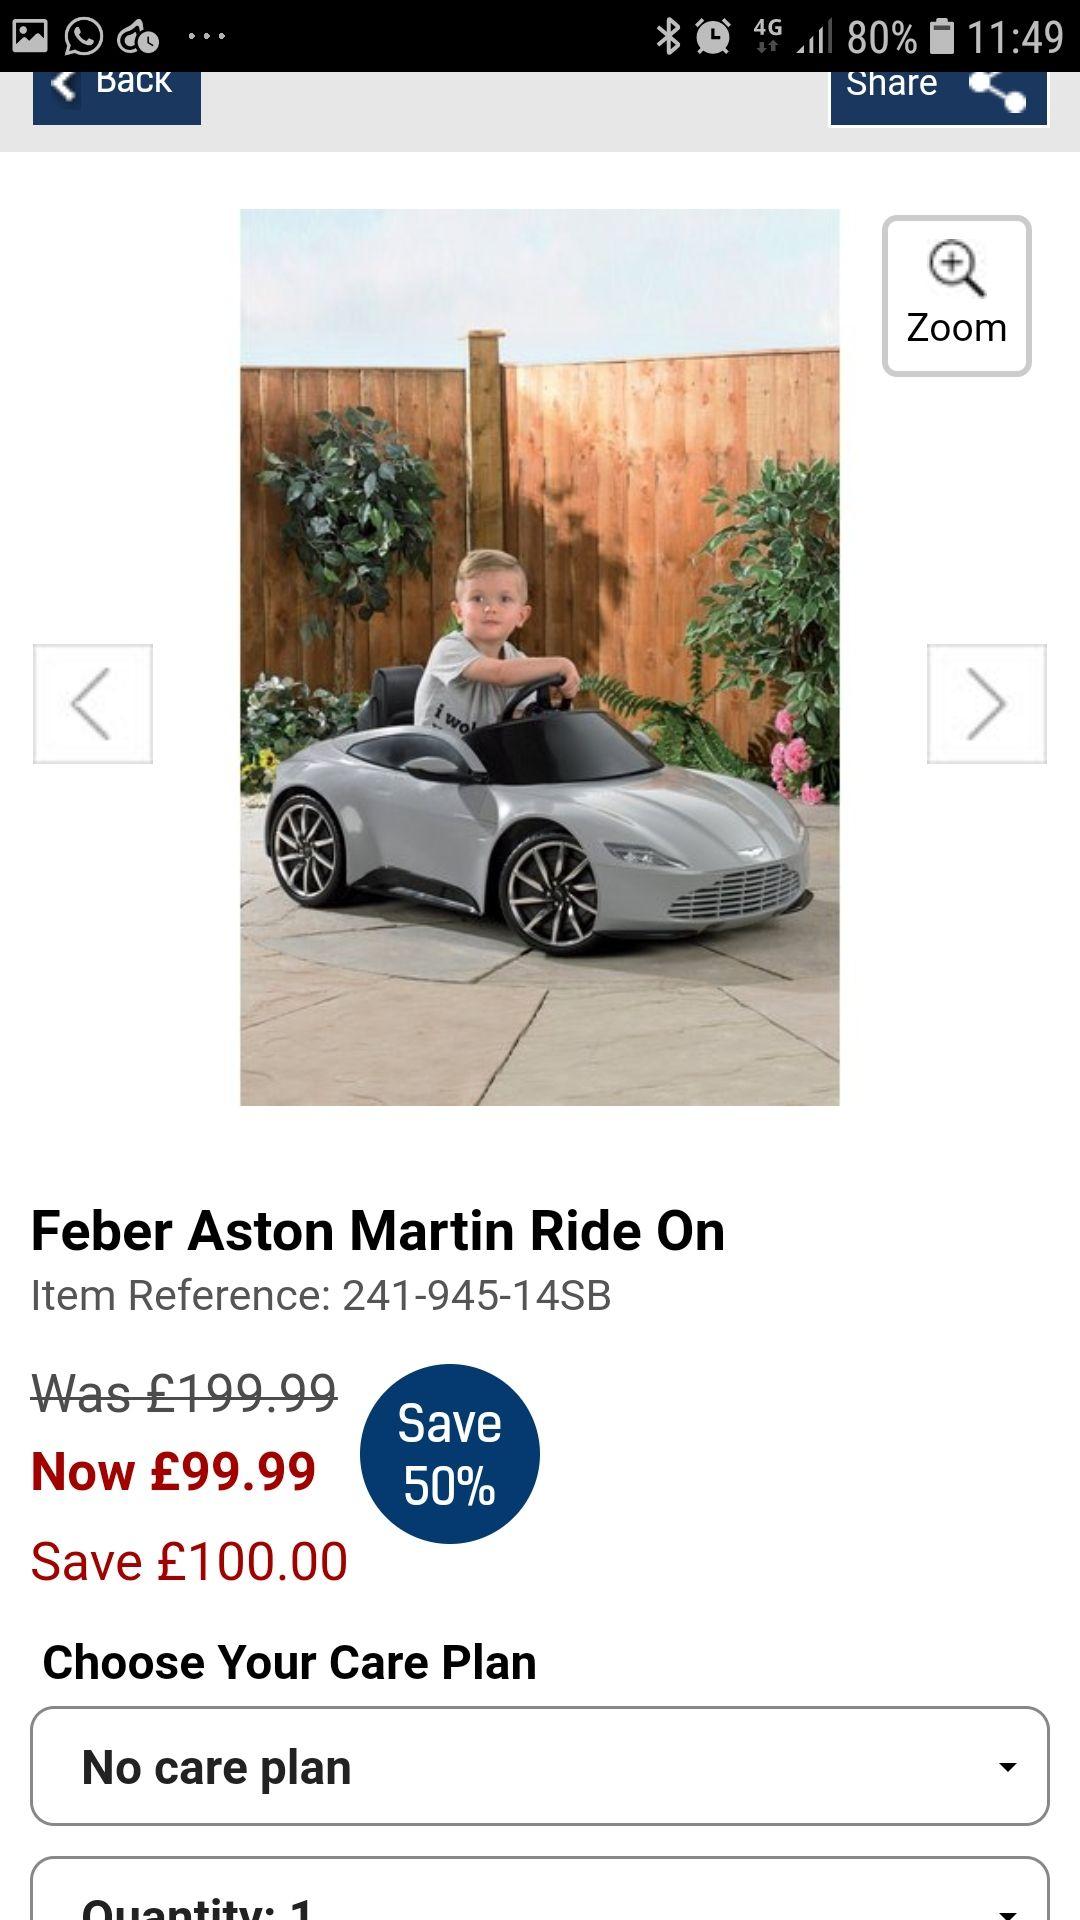 Feber Aston Martin Ride on @ Studio £99 (was £199)